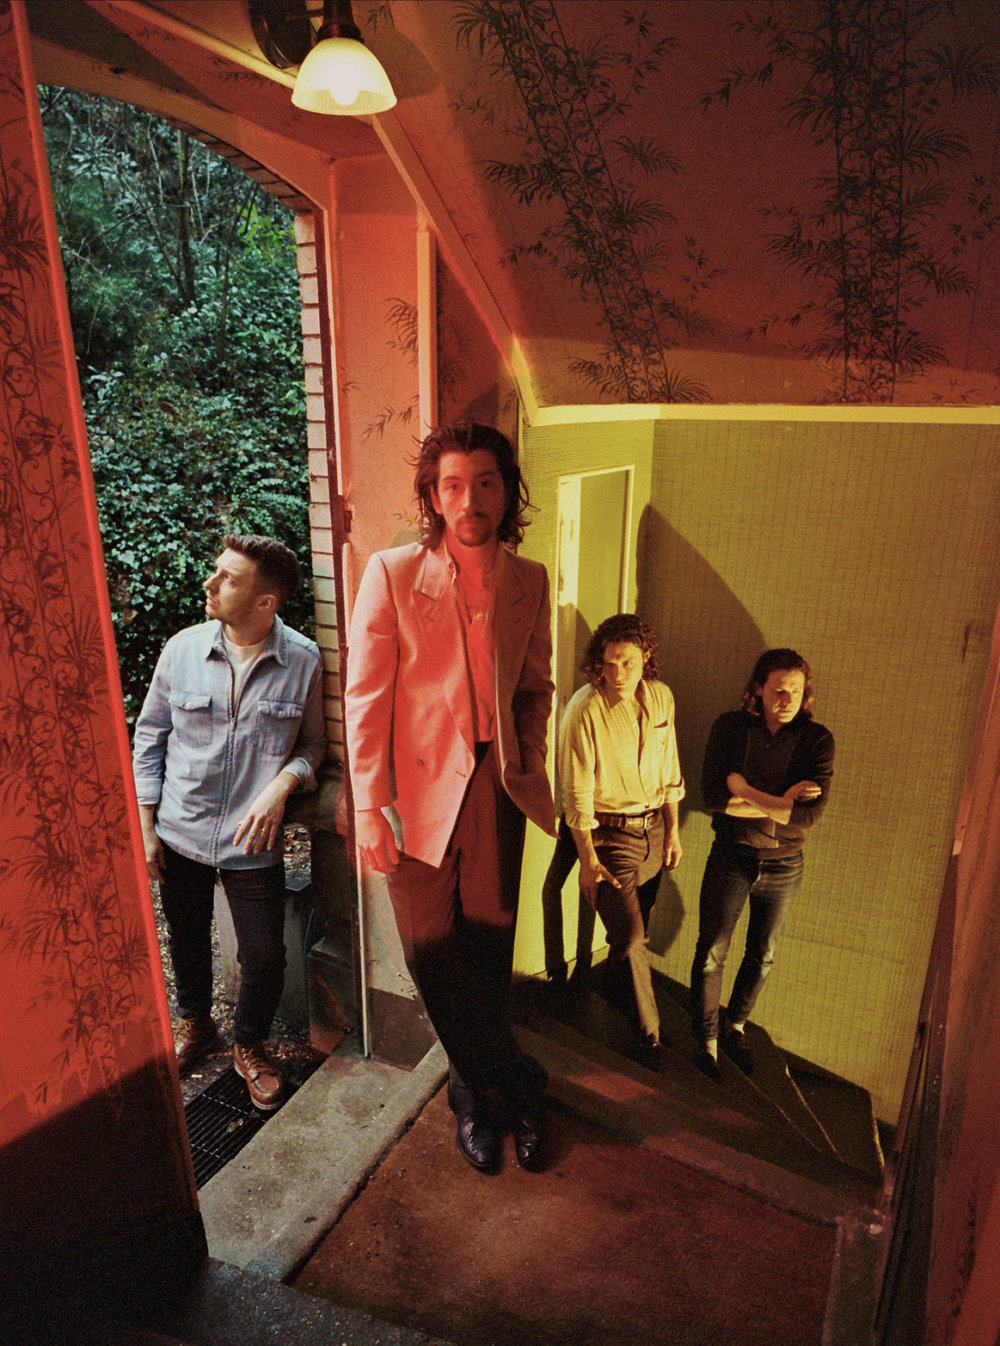 Arctic Monkeys fot. Michael Zackery